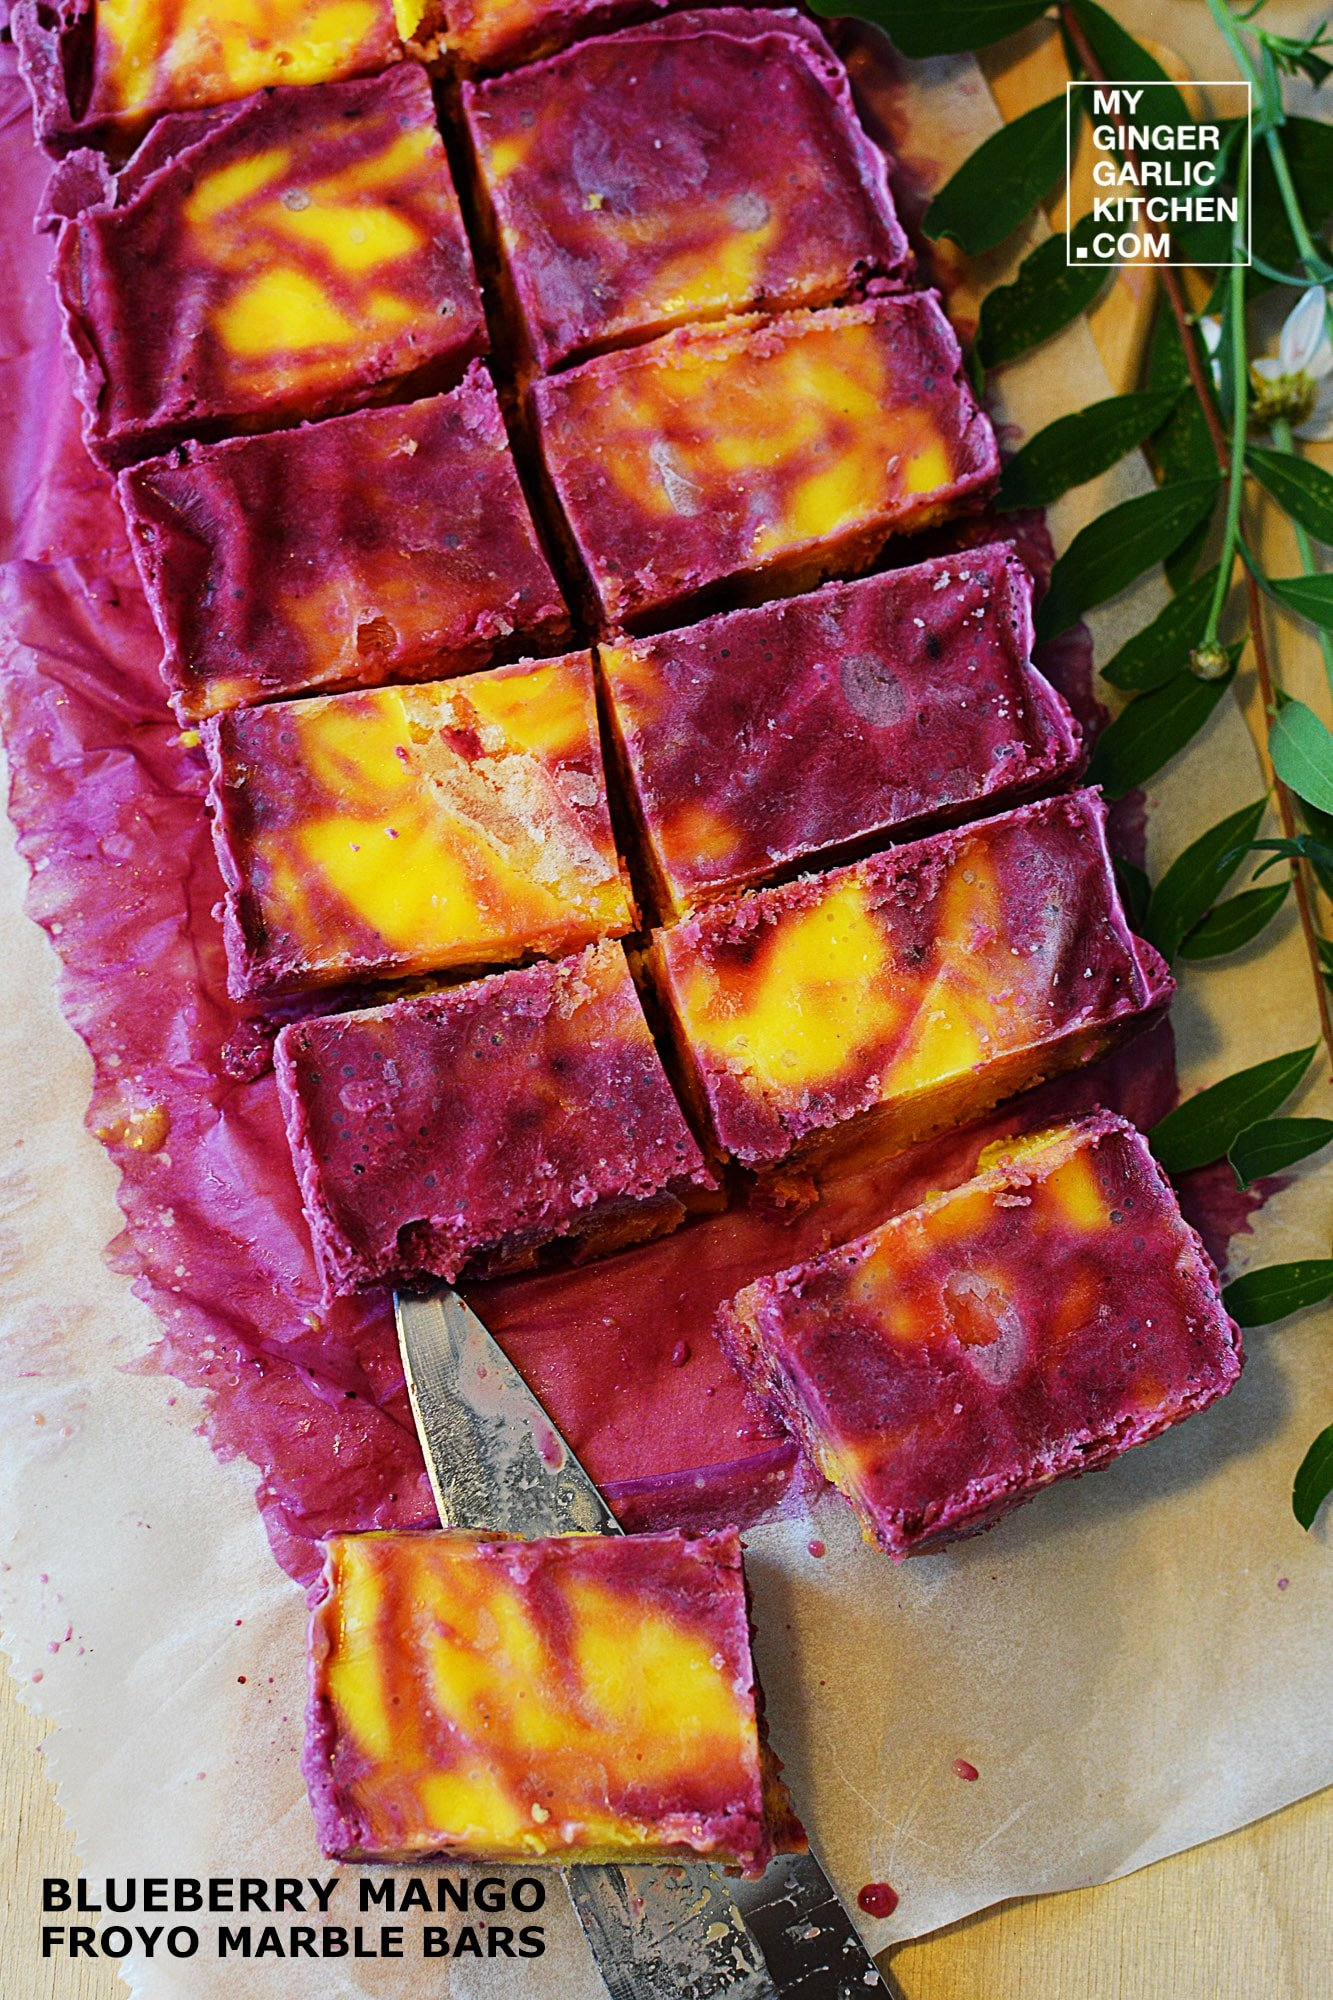 Image - recipe blueberry mango froyo marble bars anupama paliwal my ginger garlic kitchen 4